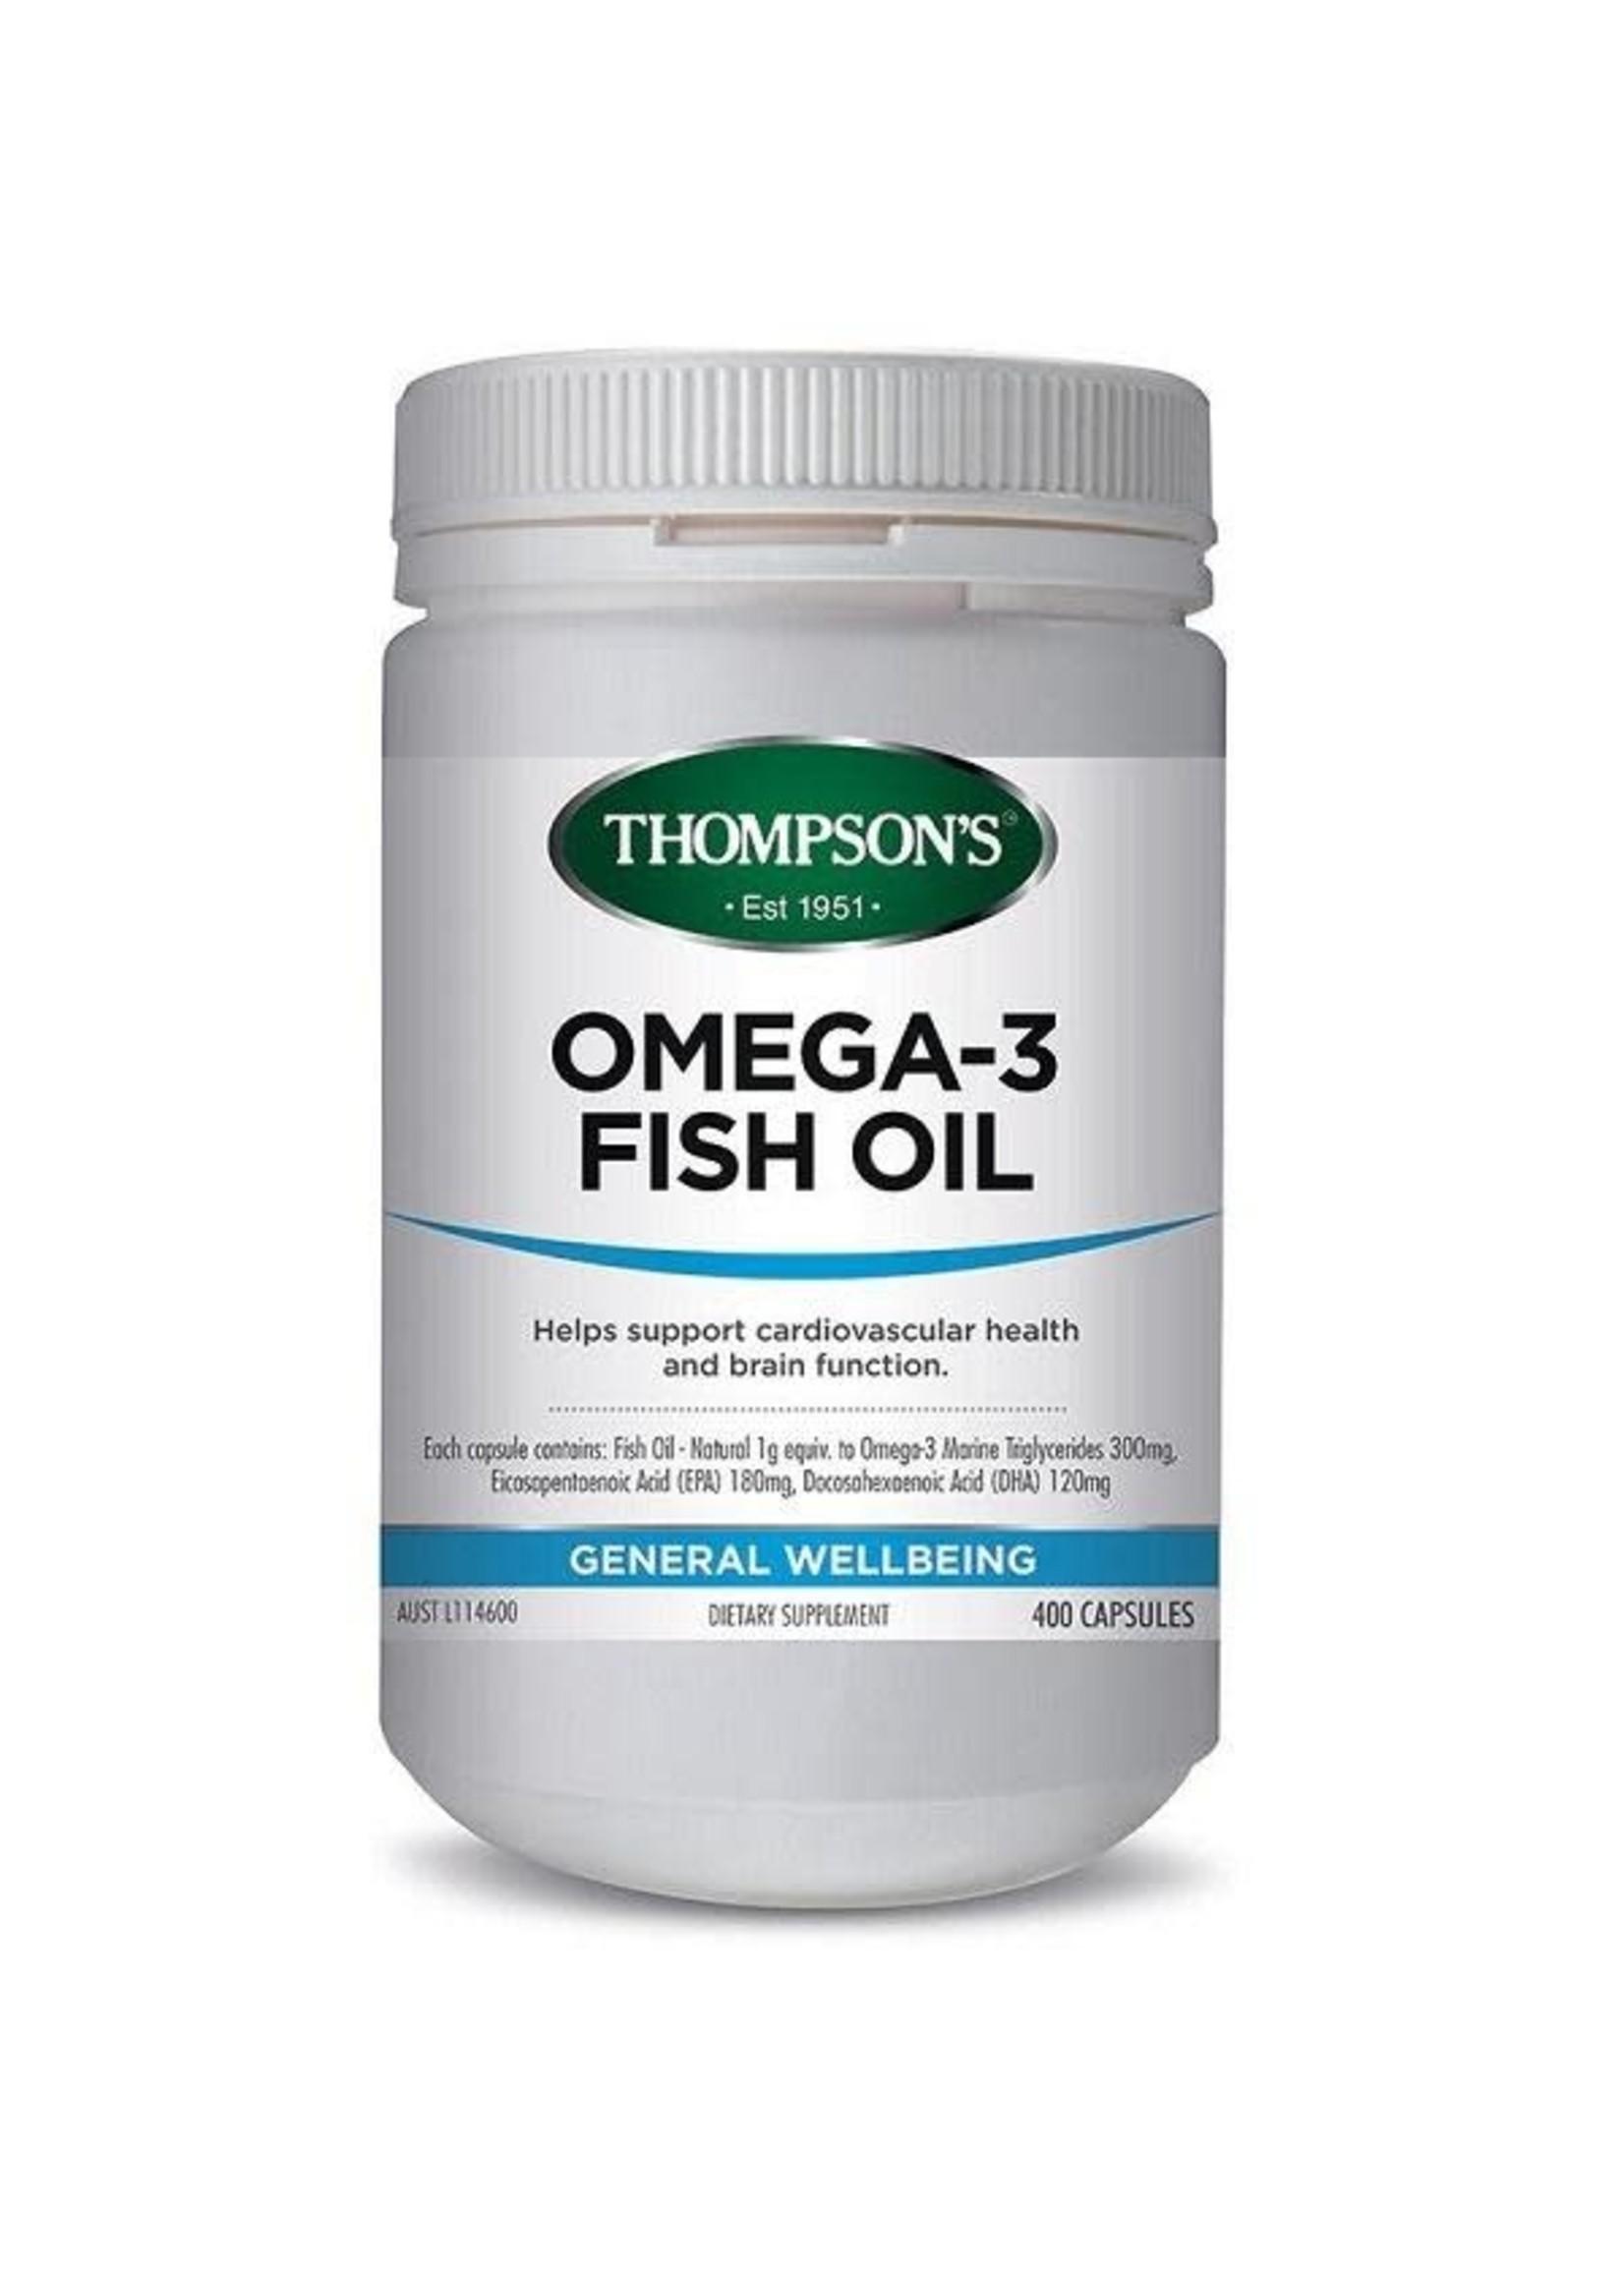 Thompson's Thompsons Omega-3 Fish Oil 400caps